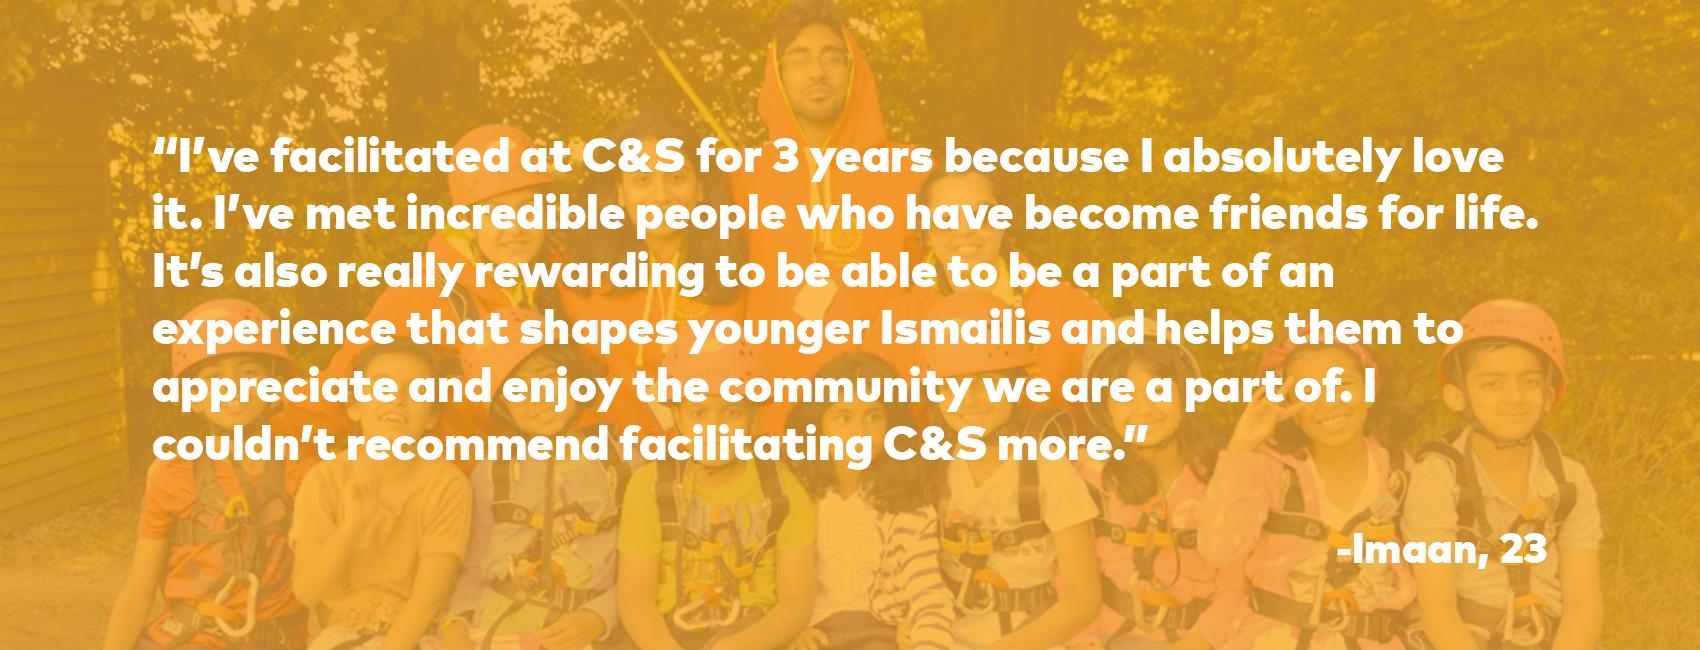 cs-testimonials-3